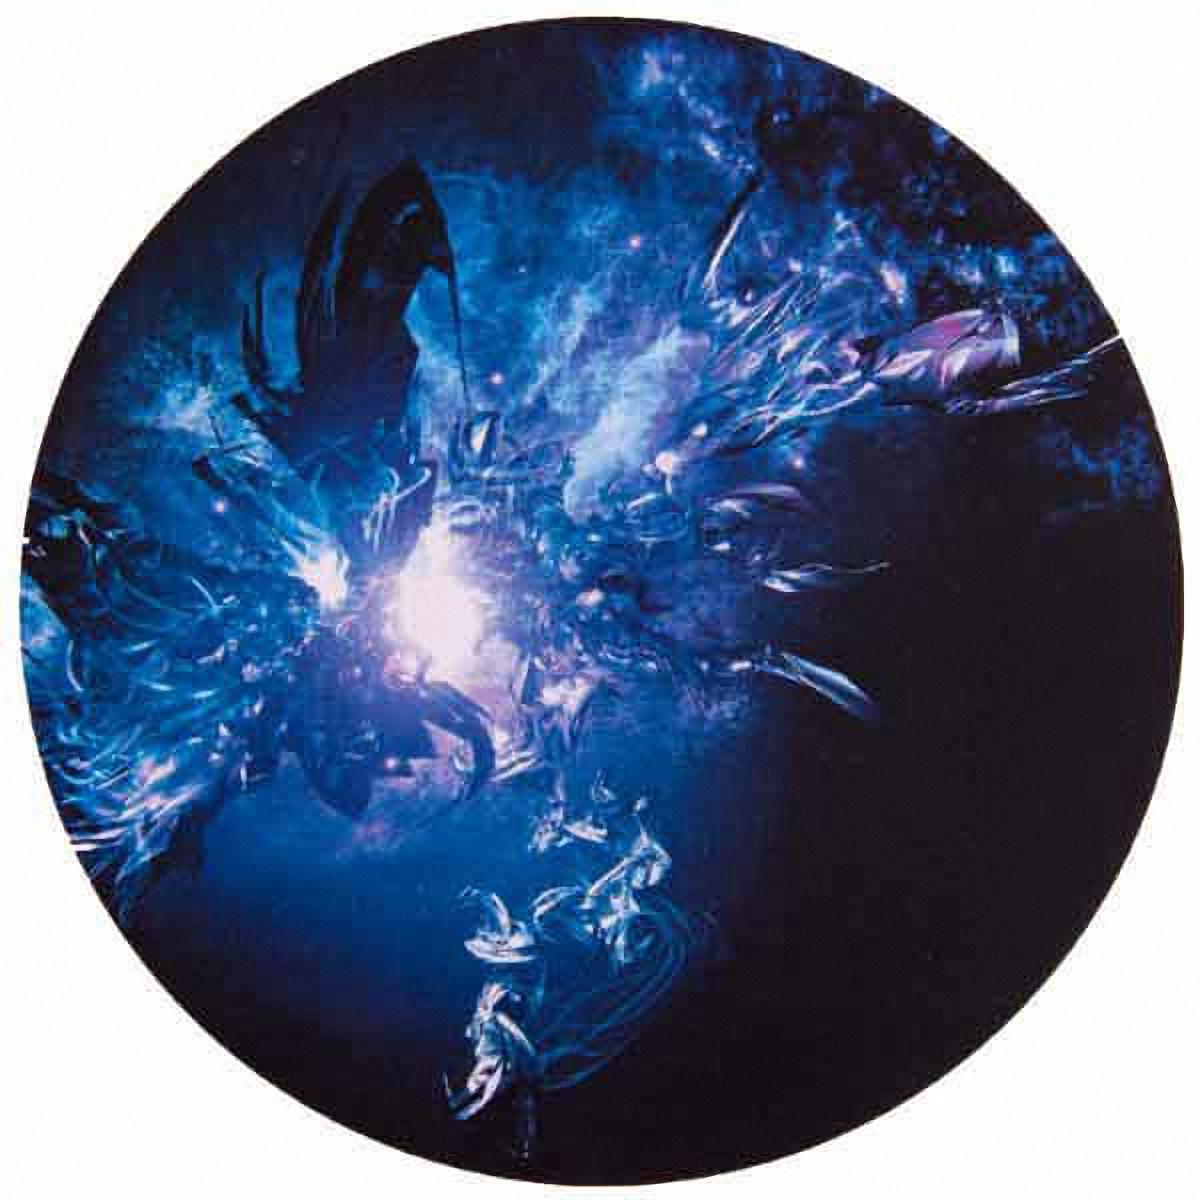 Чехол на запасное колесо Skyway Абстракция 2, диаметр 67 см. S06301007 чехол skyway s06301007